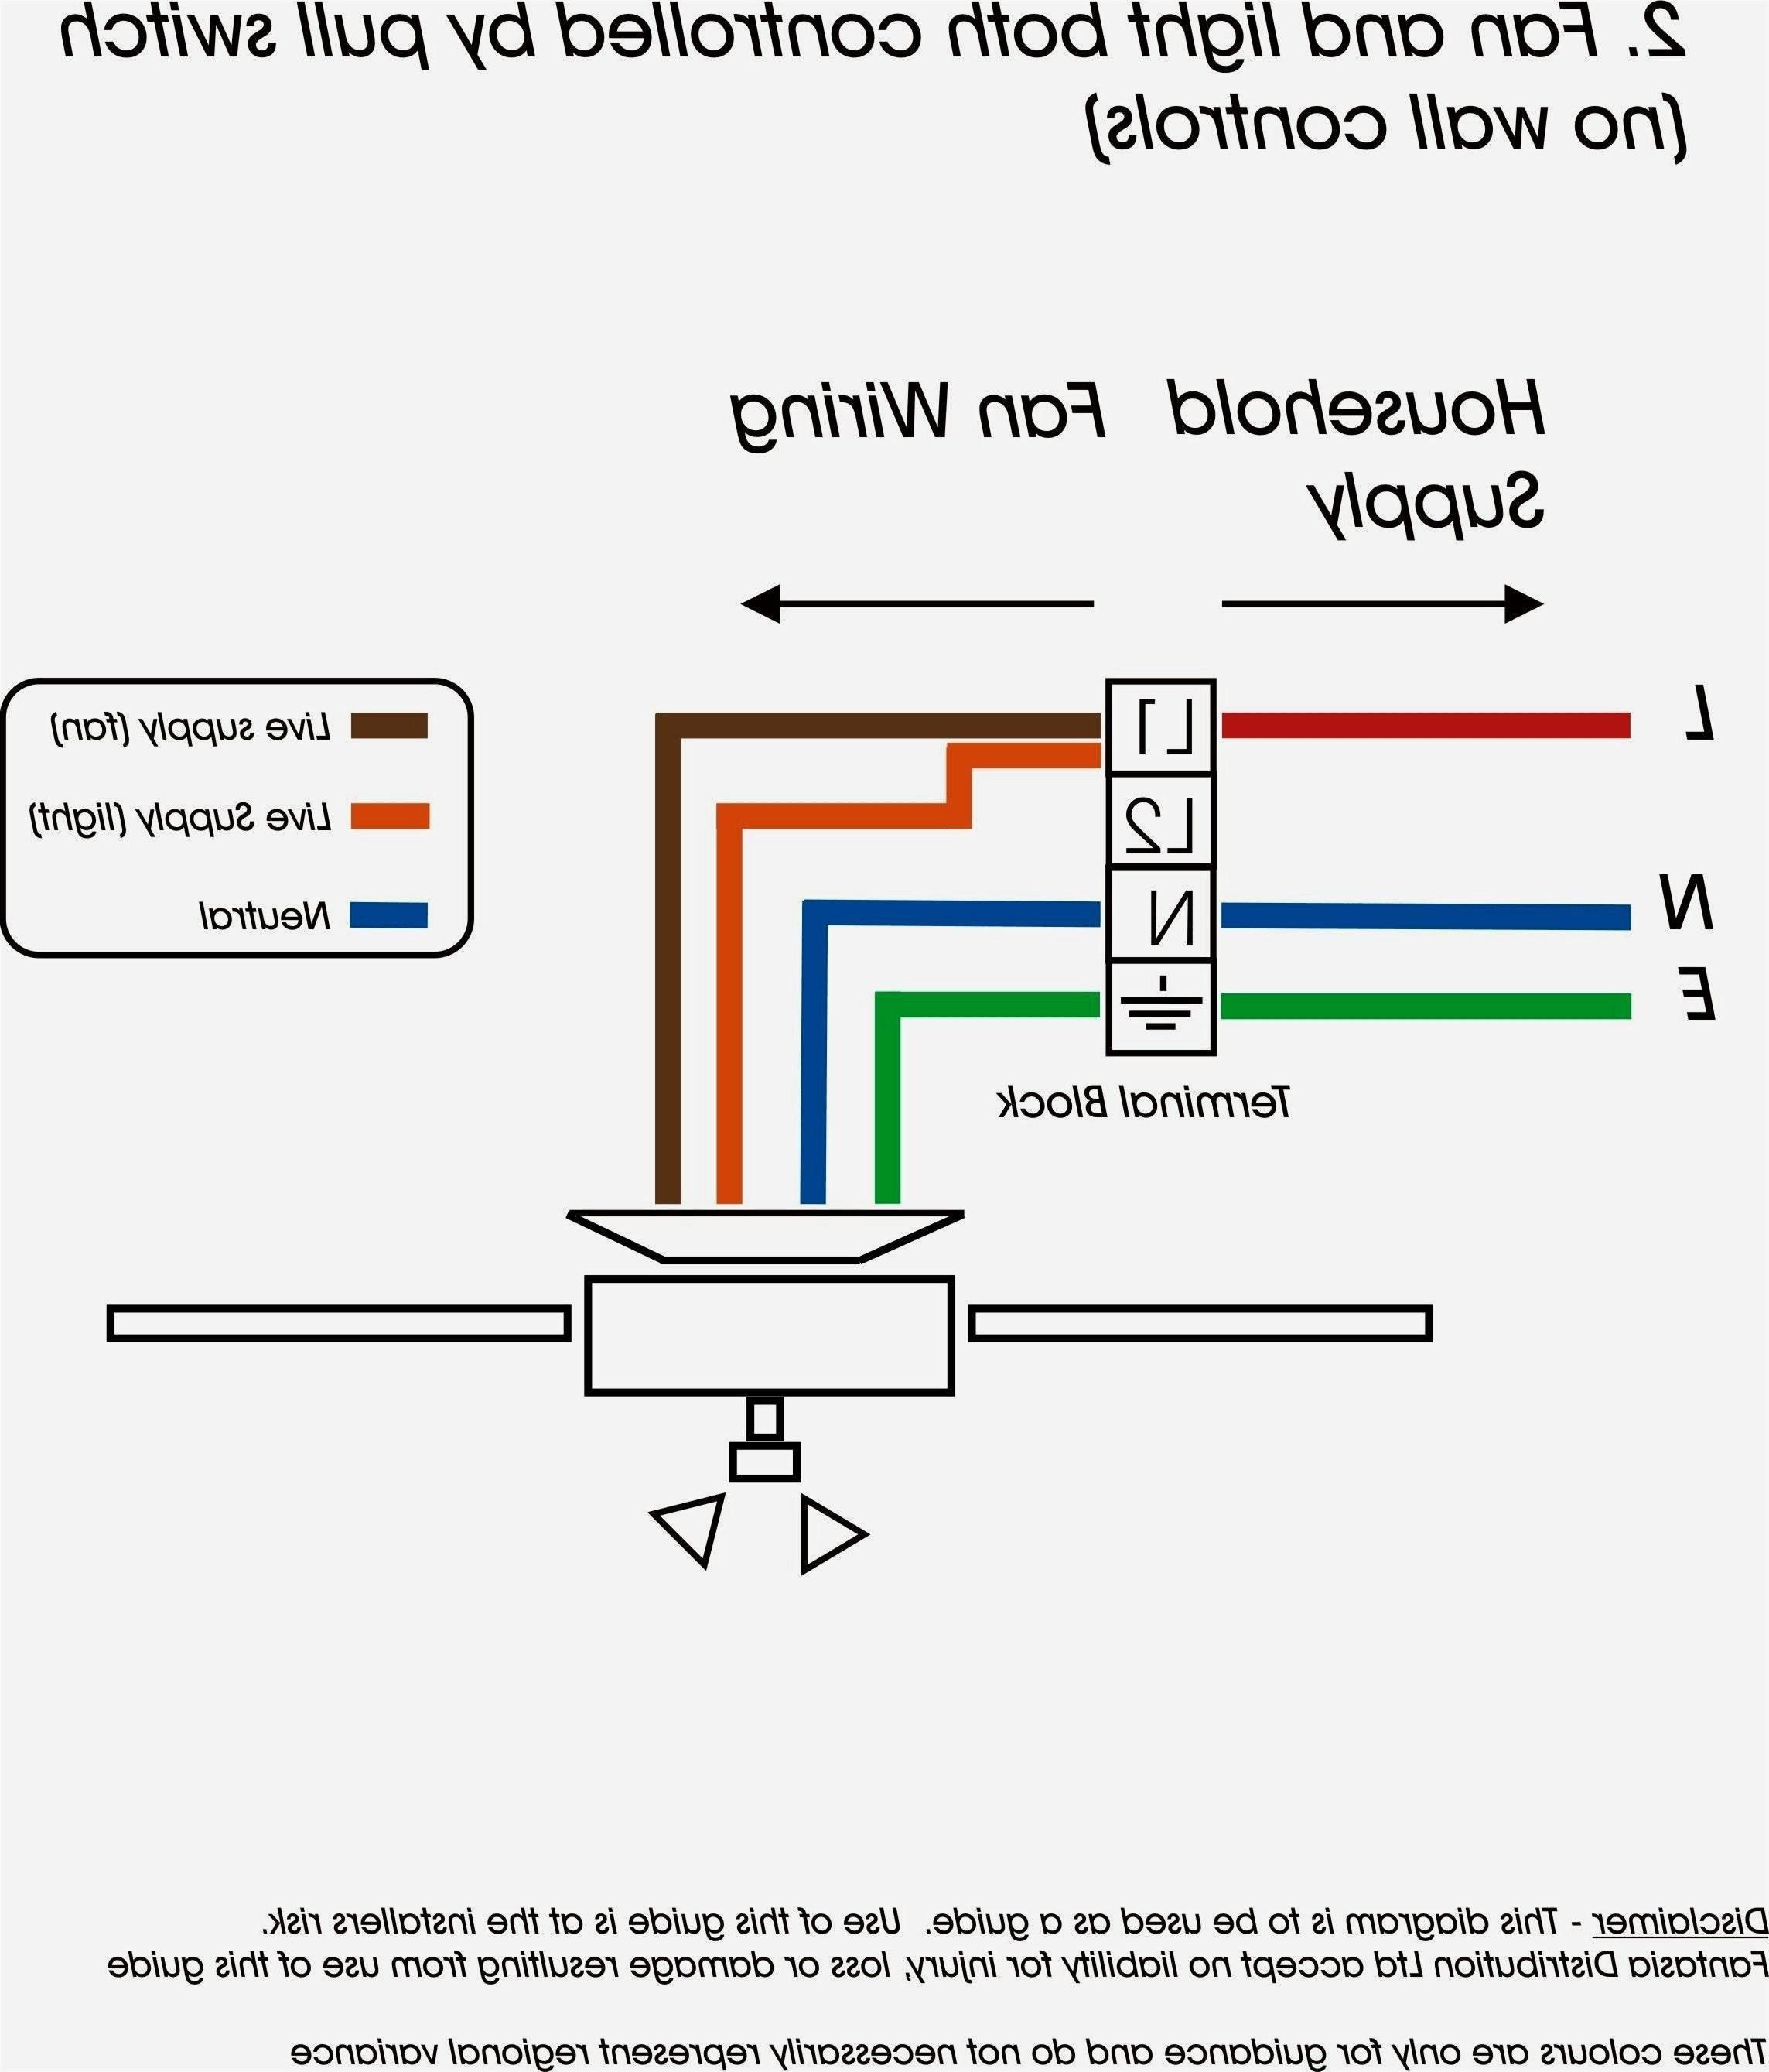 Wiring Diagram for Ibanez Blazer Guitar Fresh 5 Way Rotary Switch Wiring Diagram Chromatex